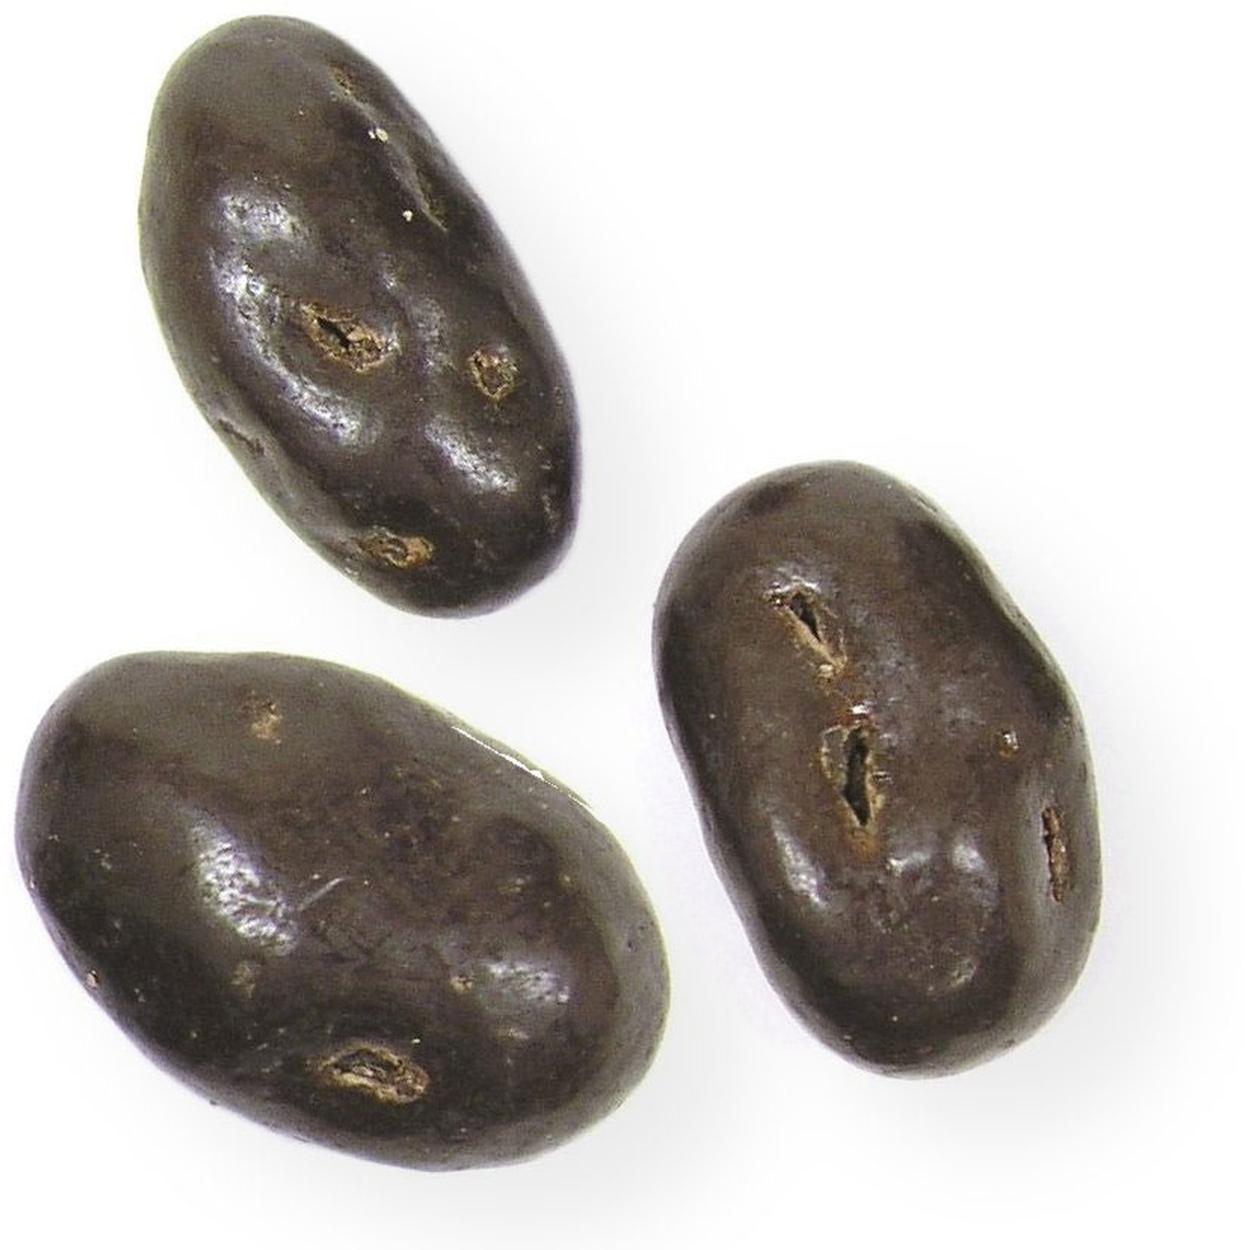 Dark Chocolate Covered Raisins • Chocolate Covered Dried Fruit ...